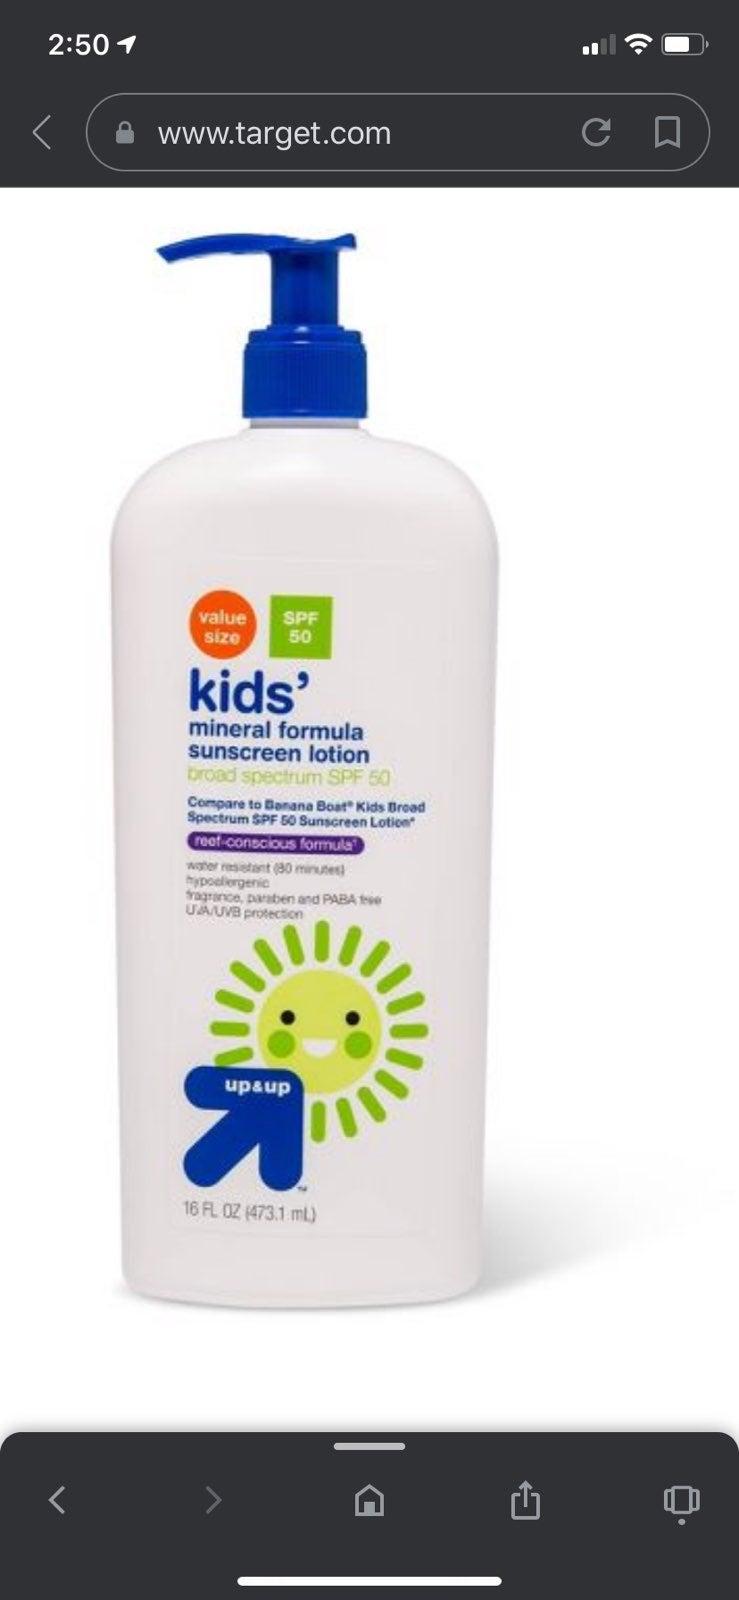 KIDS Sunscreen Lotion -SPF50 16 fl oz UP